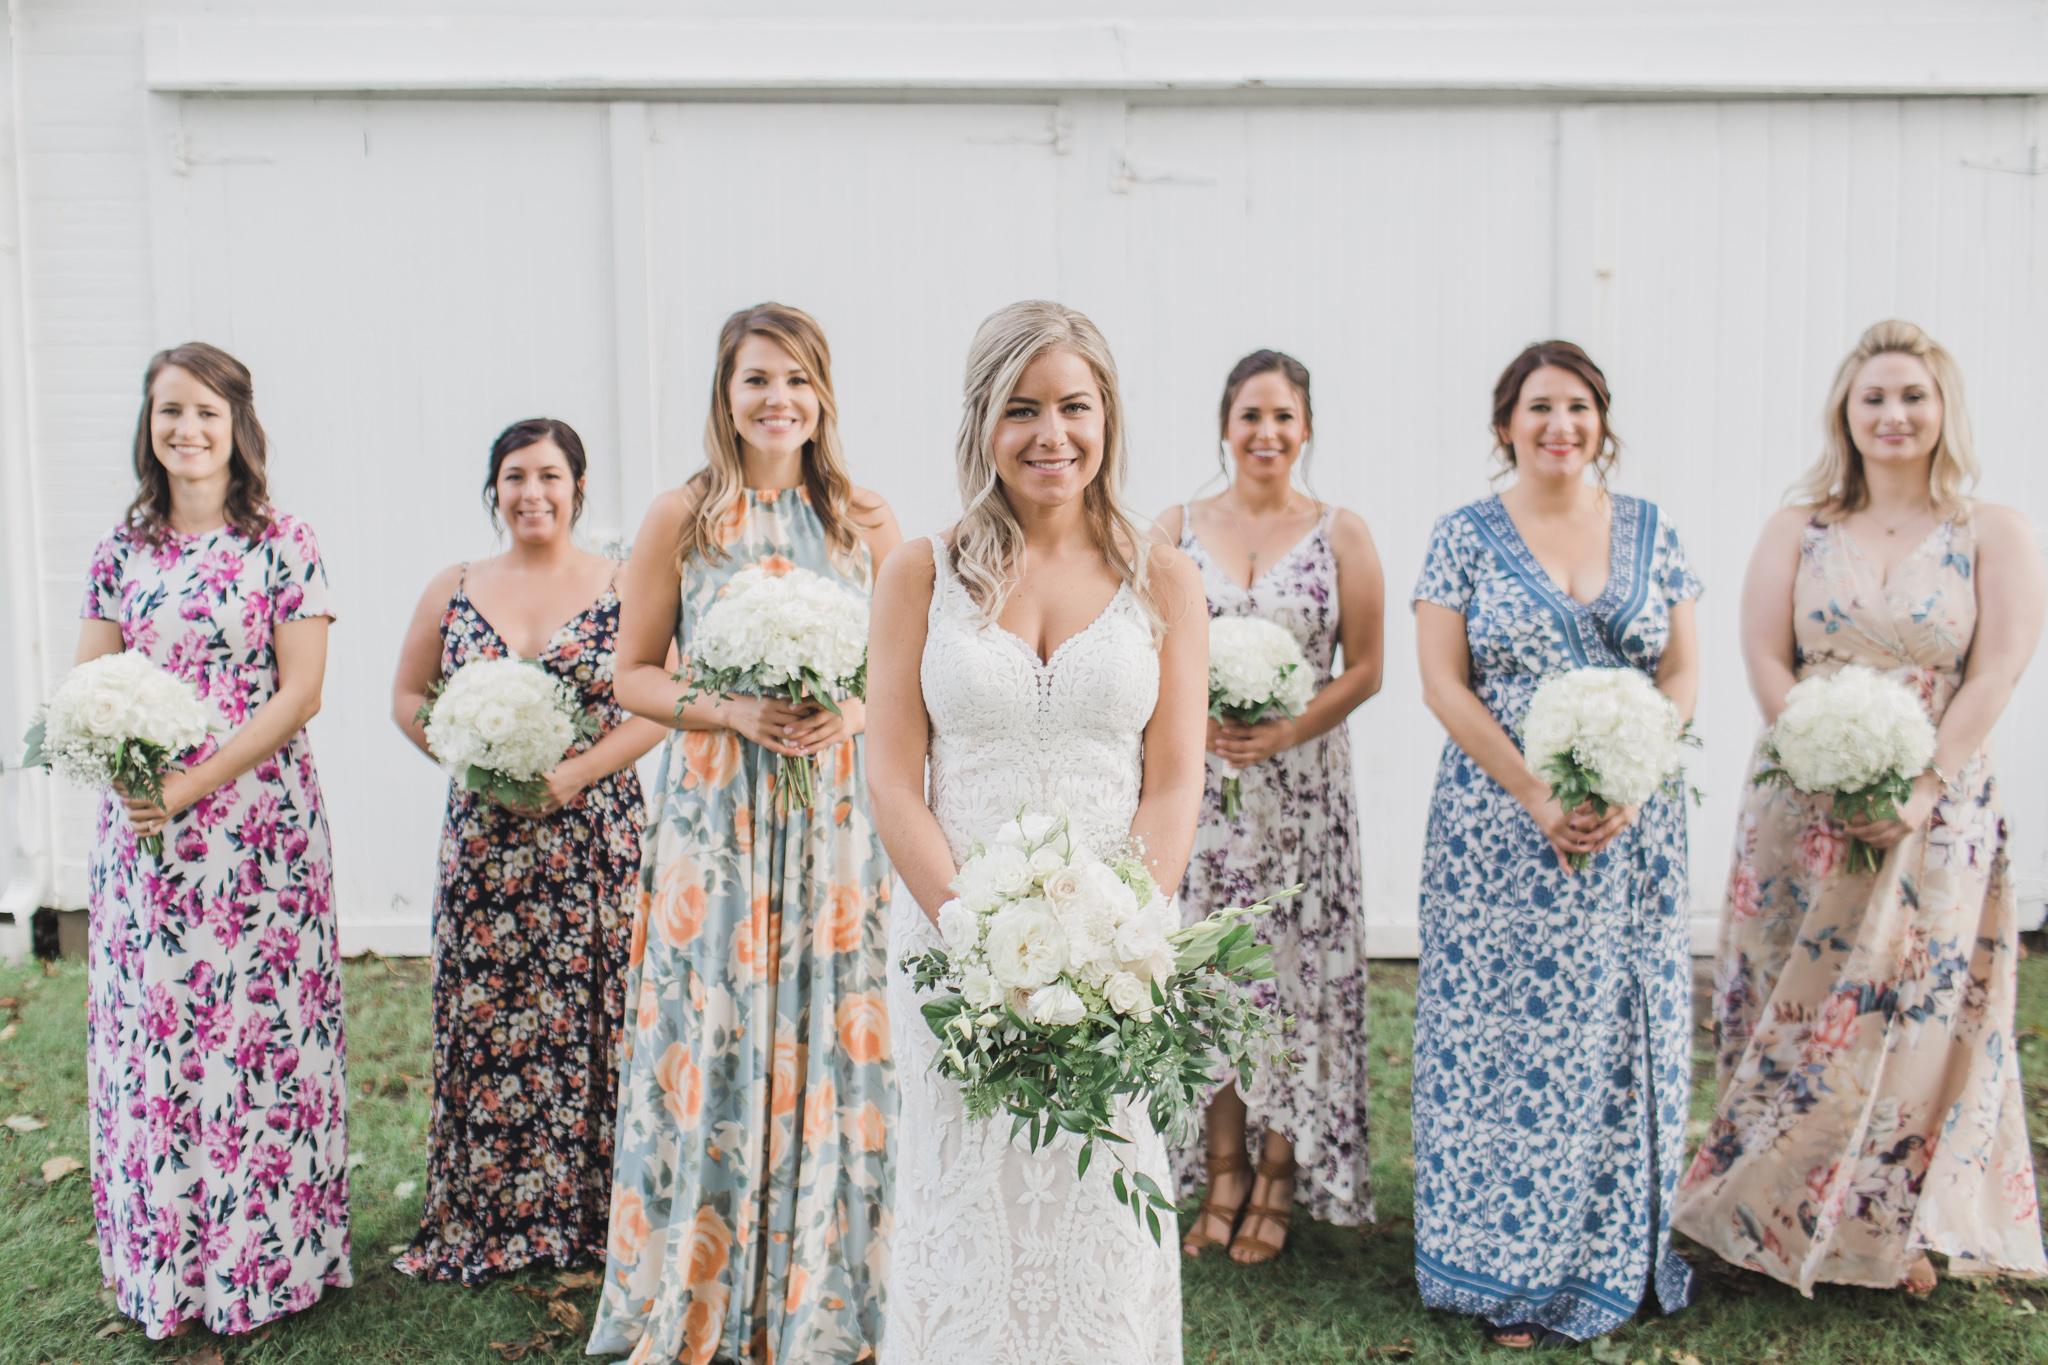 TOP_2019_Wedding_13.jpg